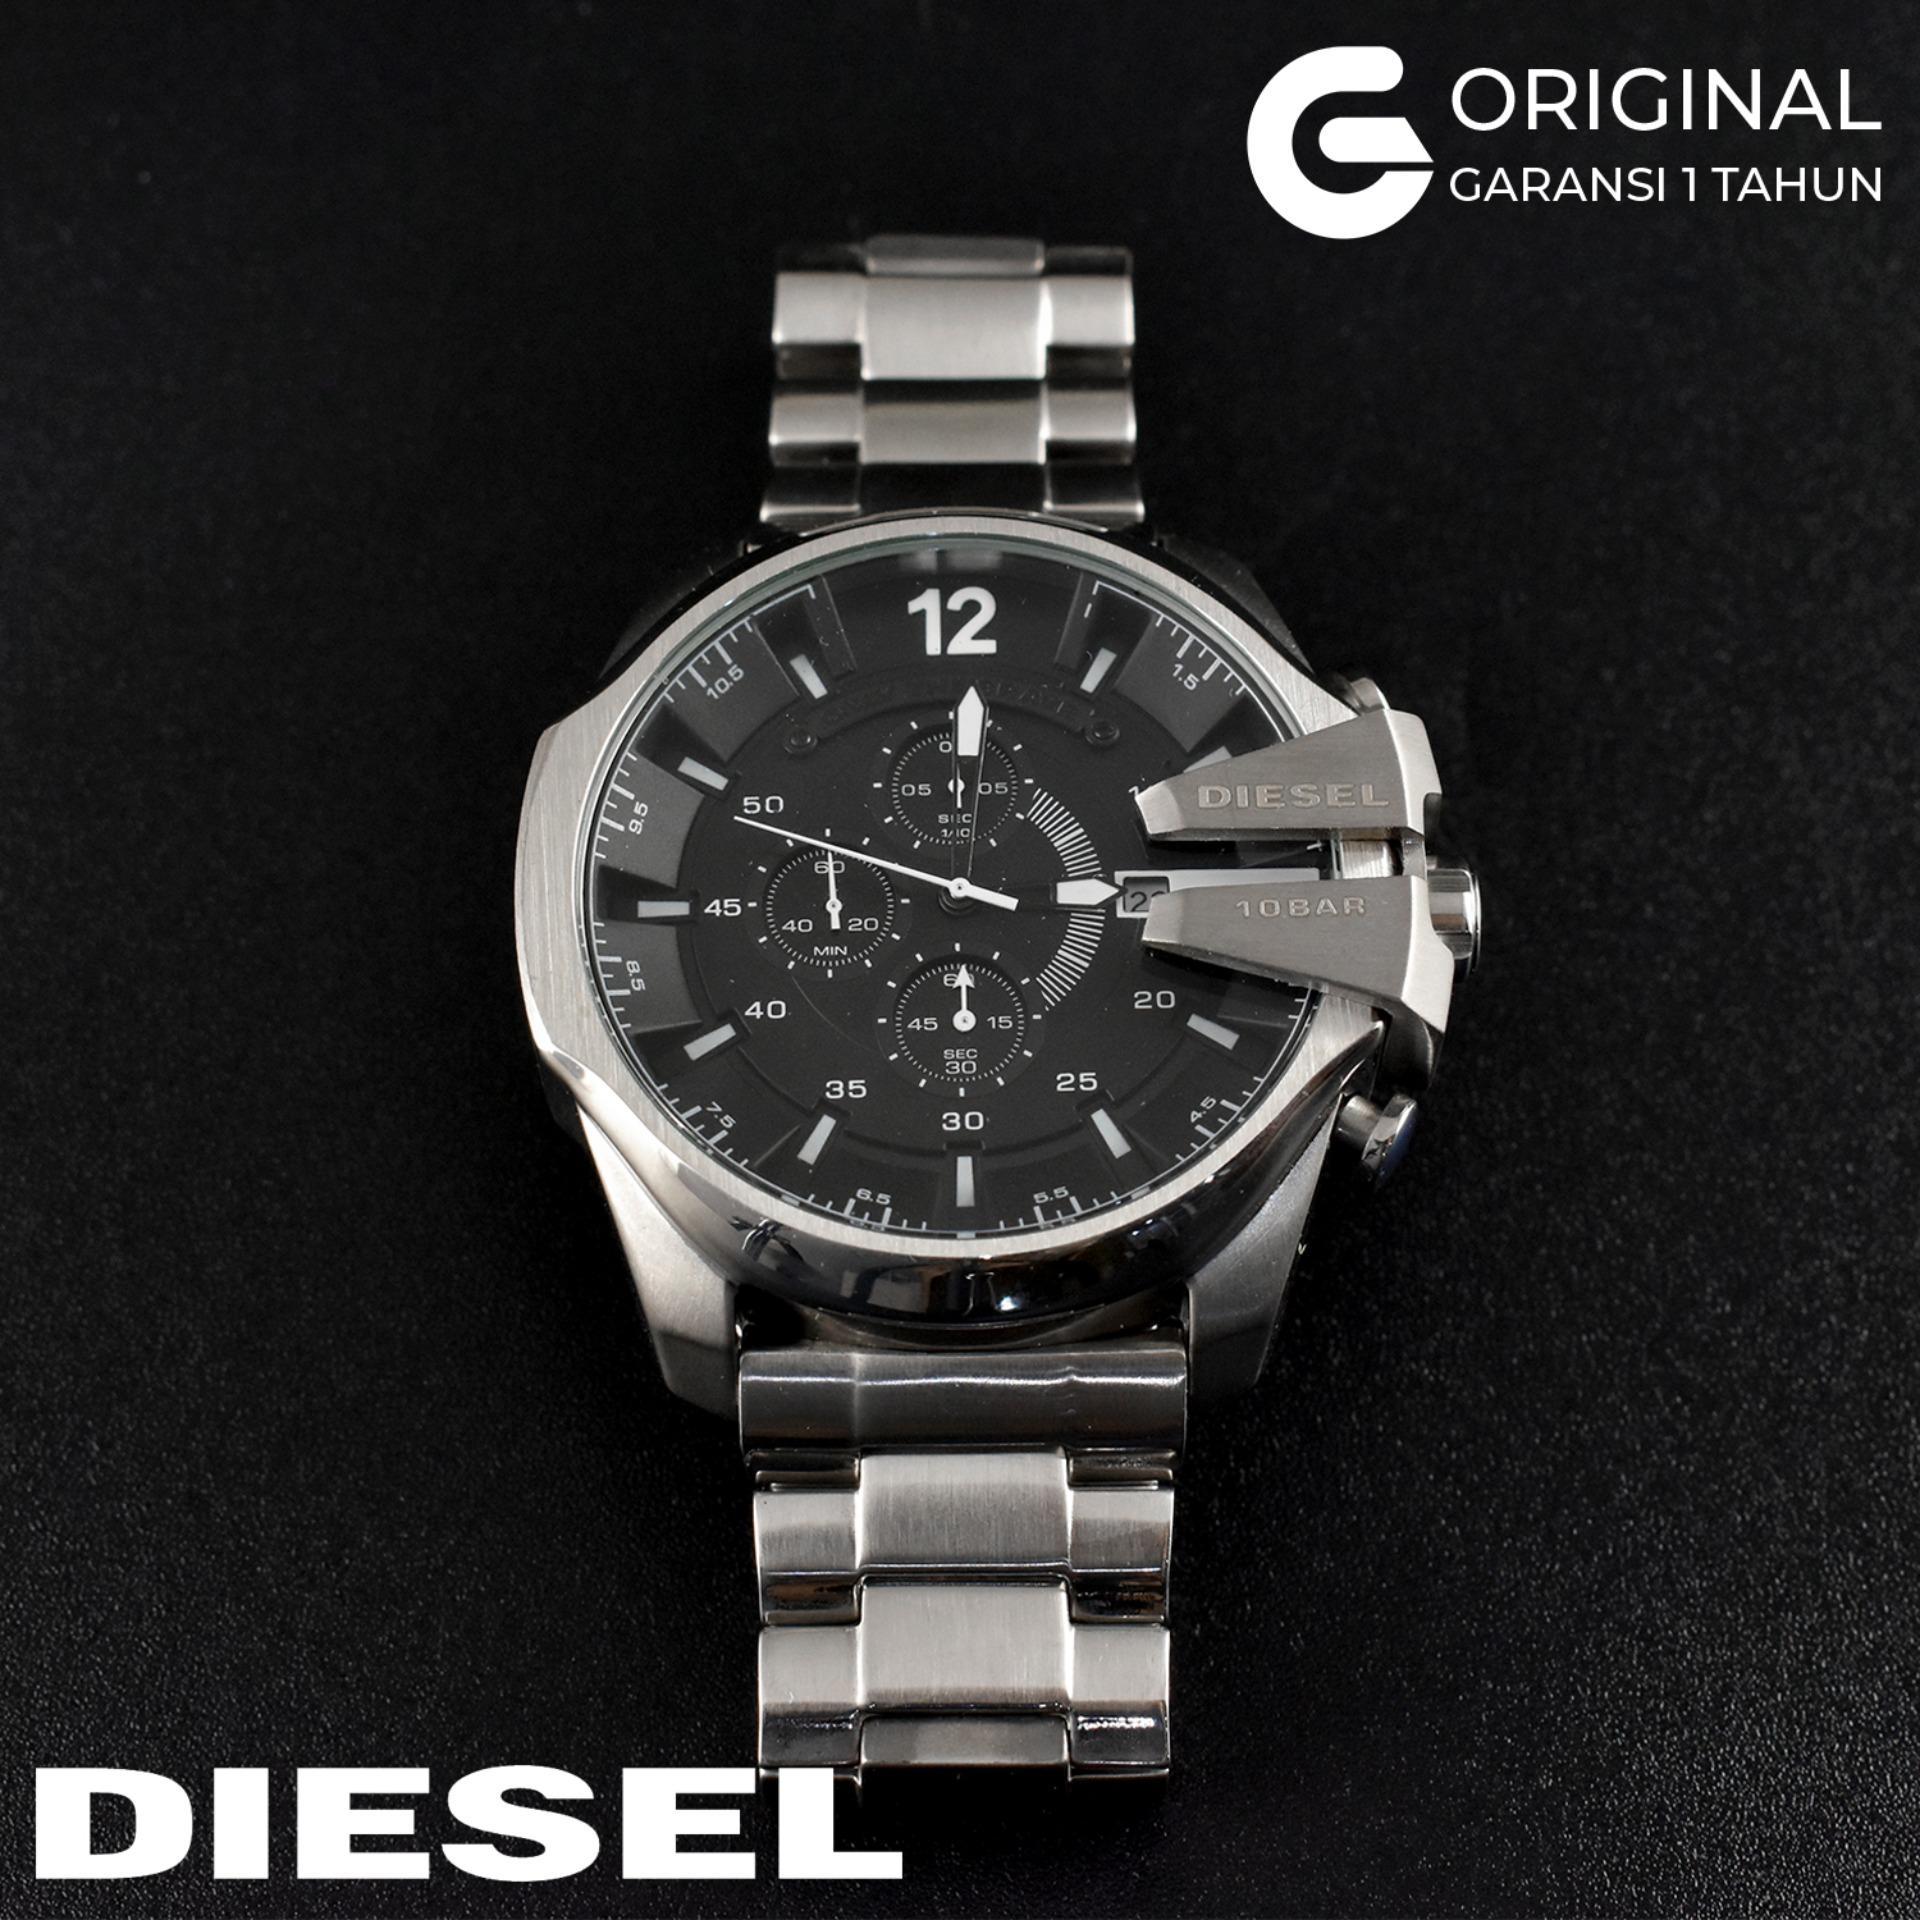 Diesel Jam Tangan Pria Diesel Kronograf Tali Rantai Logam Stainless Steel  DZ4338 DZ4309 DZ4283 Black Gold c10f2d6257